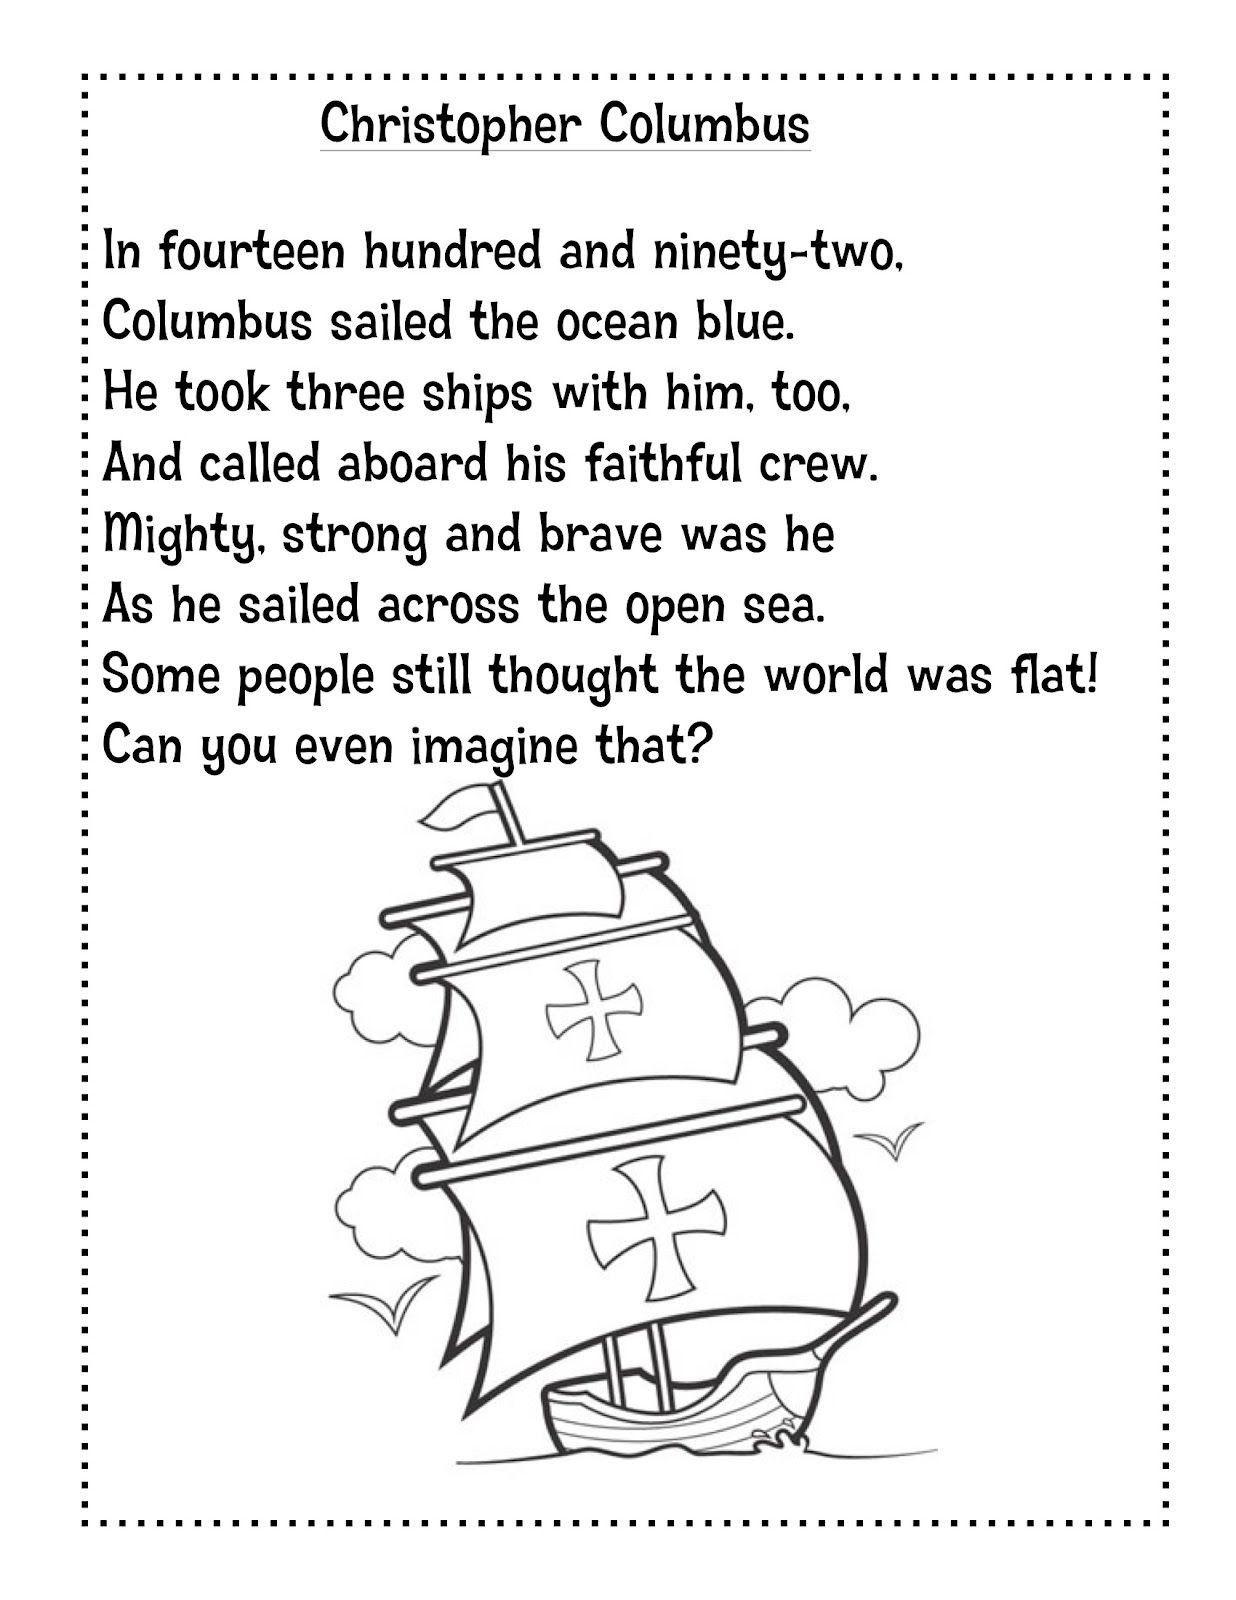 Christopher Columbus Worksheets for Elementary Unit 5 Week 3 Columbus  Explore…   First grade phonics [ 1600 x 1236 Pixel ]